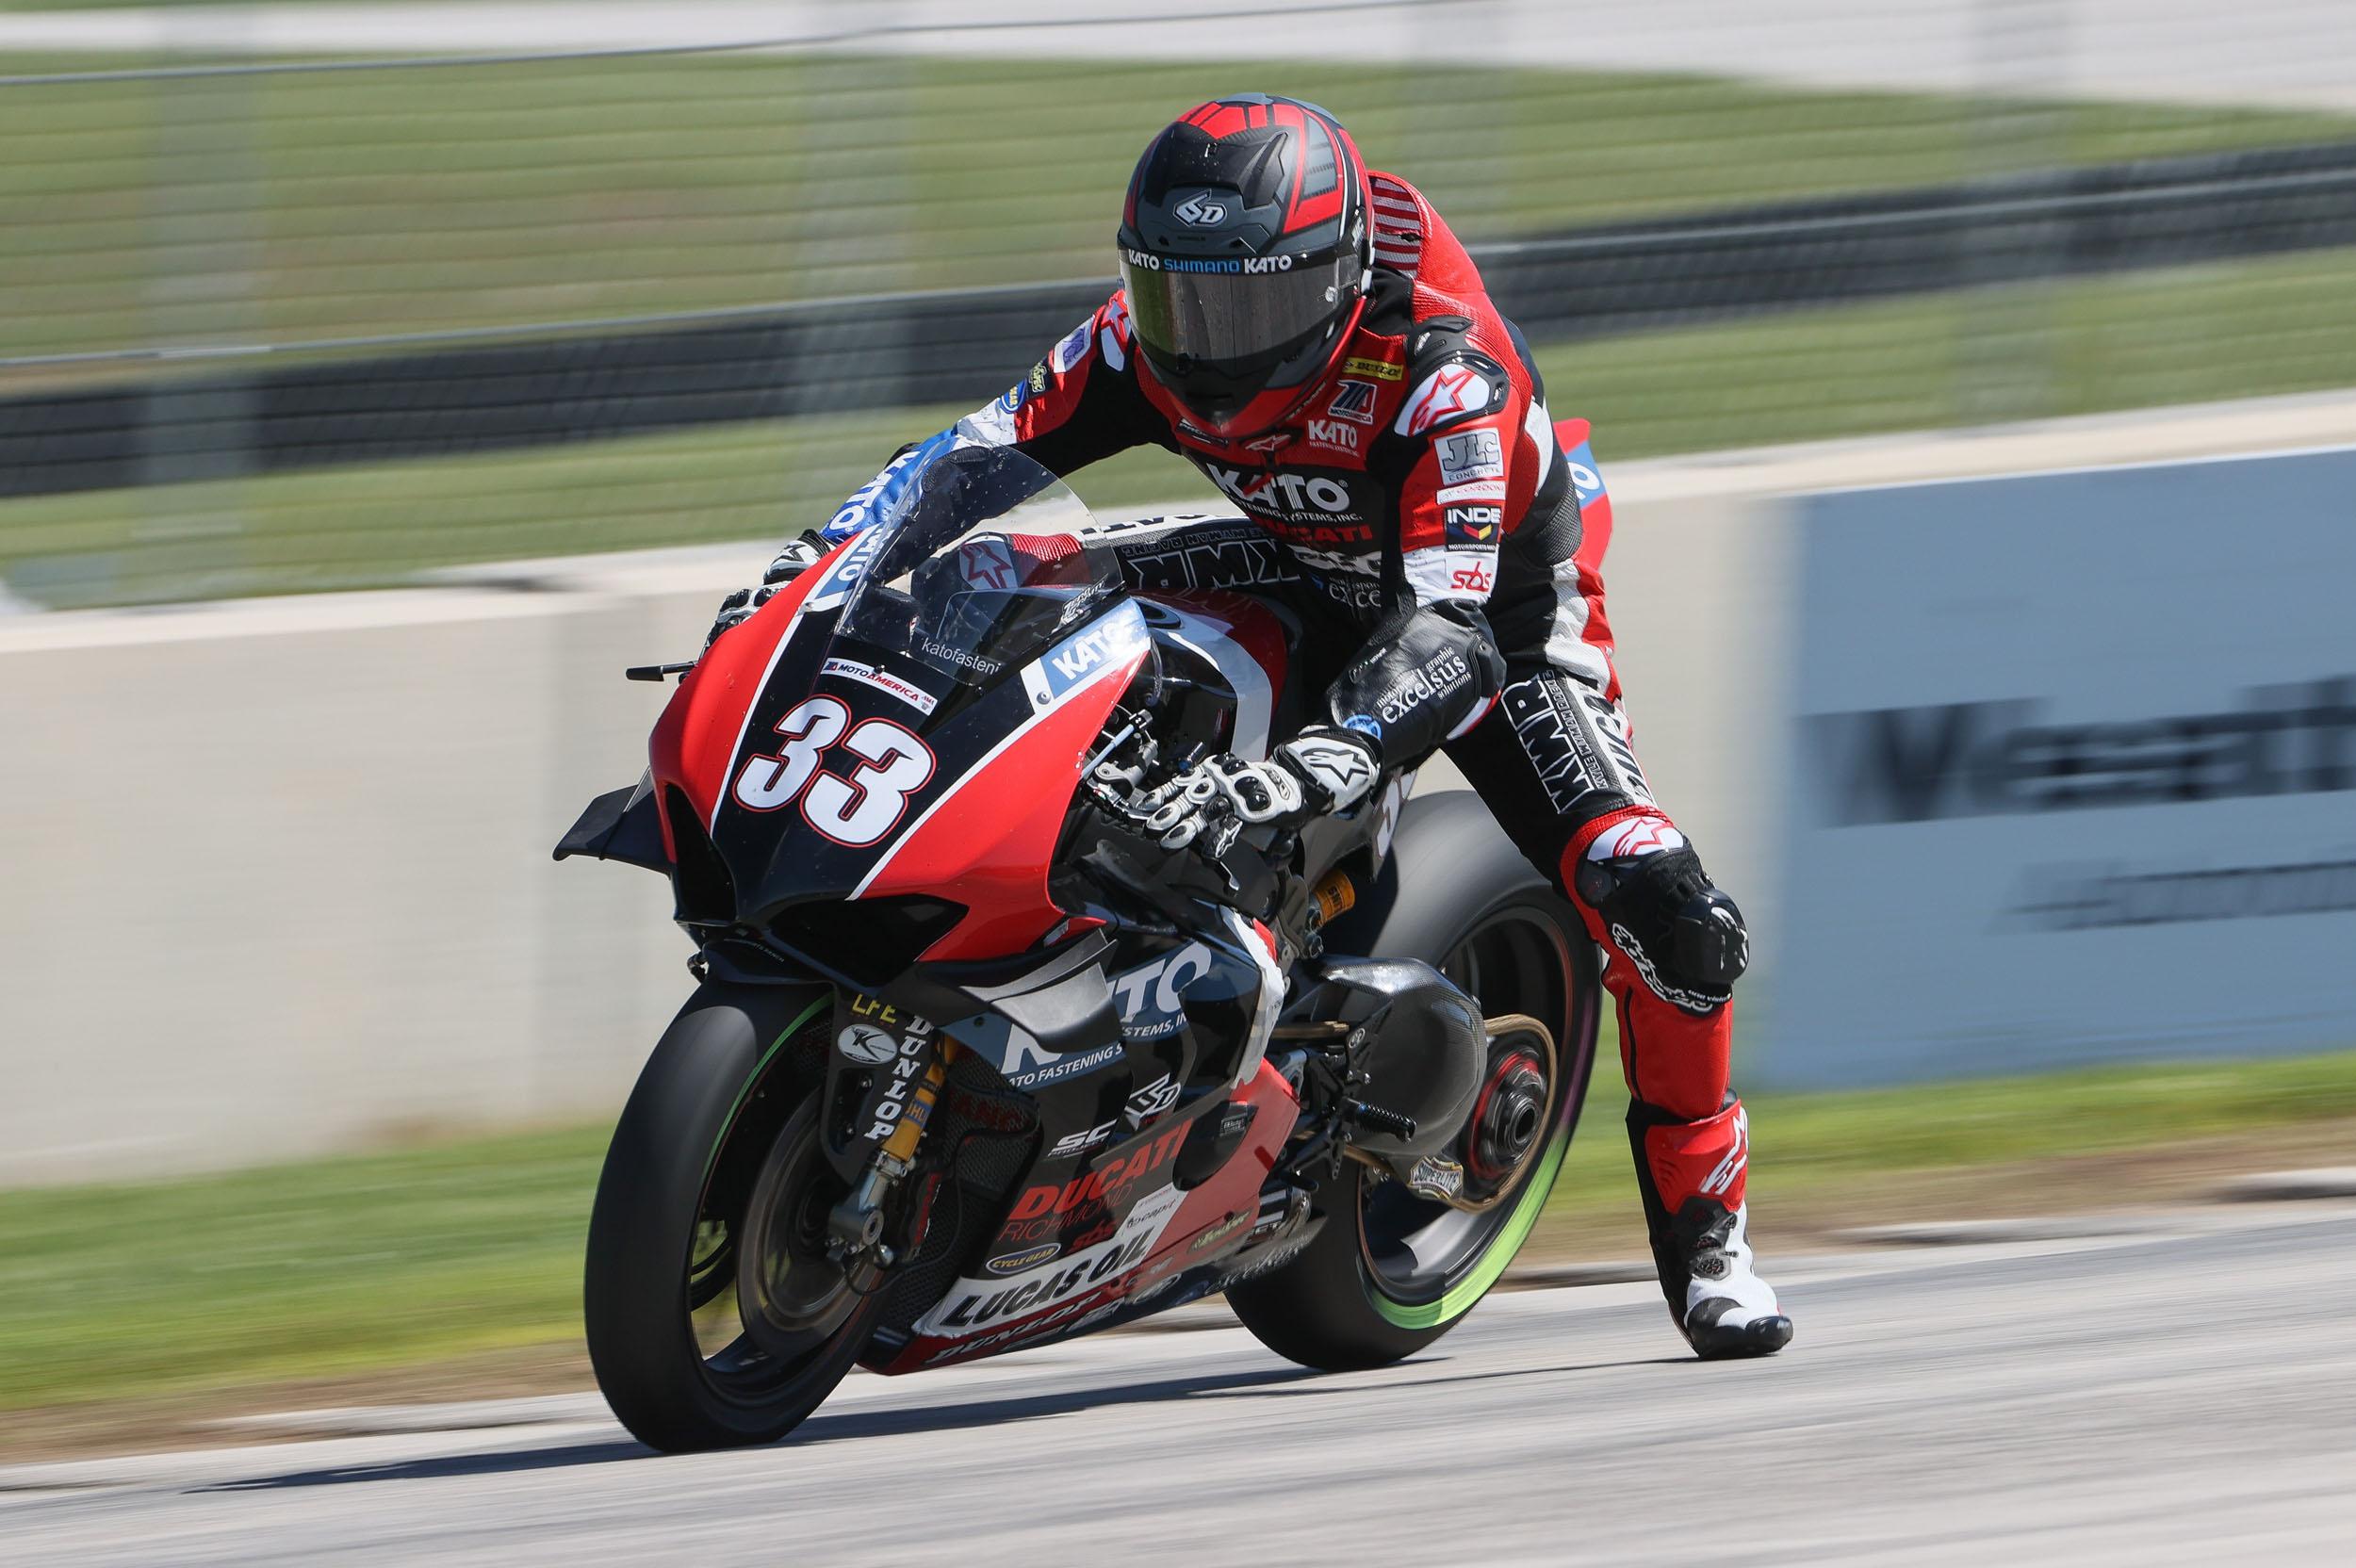 MotoAmerica - Superbike - Kyle Wyman #33 (2)